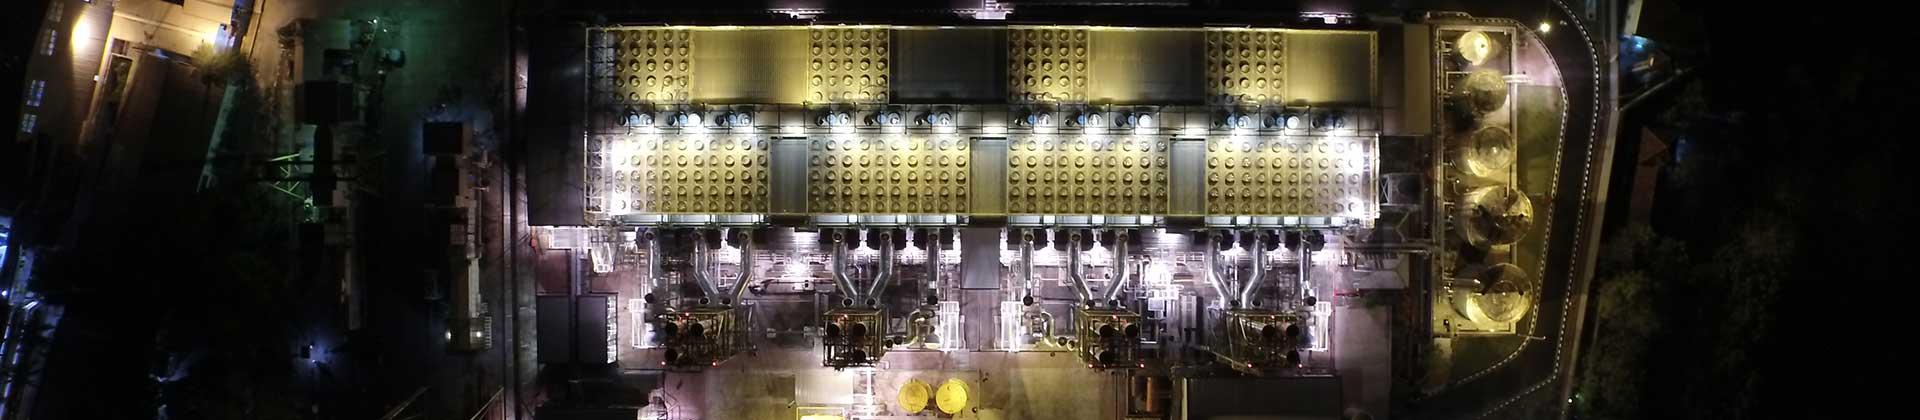 Power plant, Indonesia